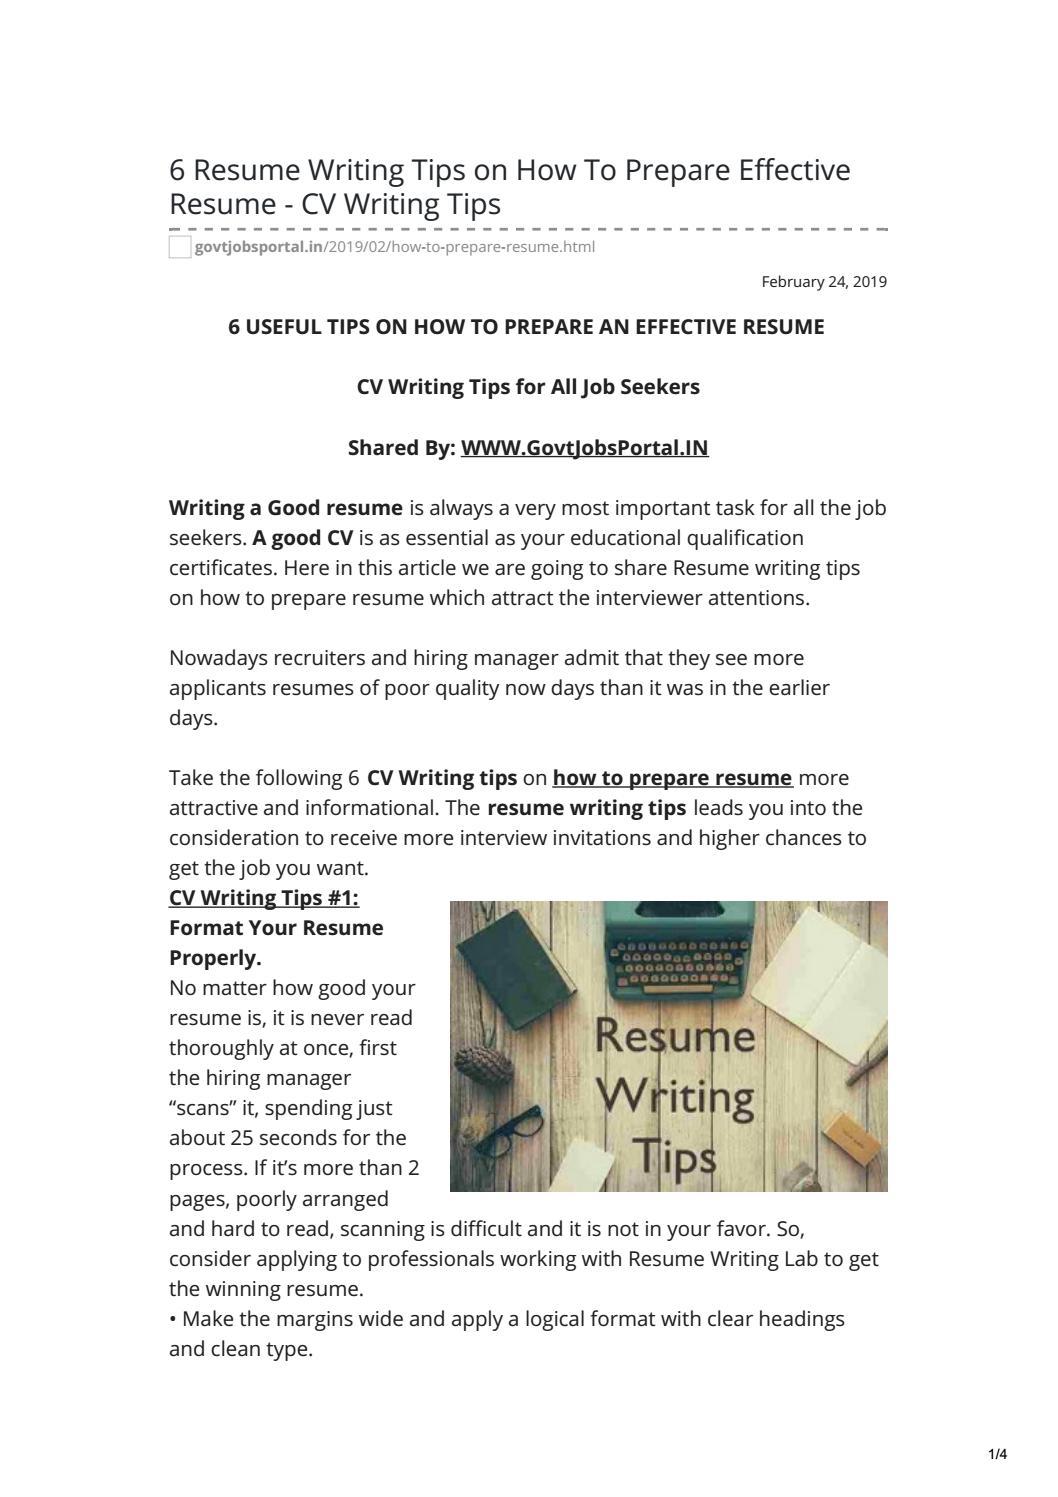 Effective Resume - CV Writing Tips.